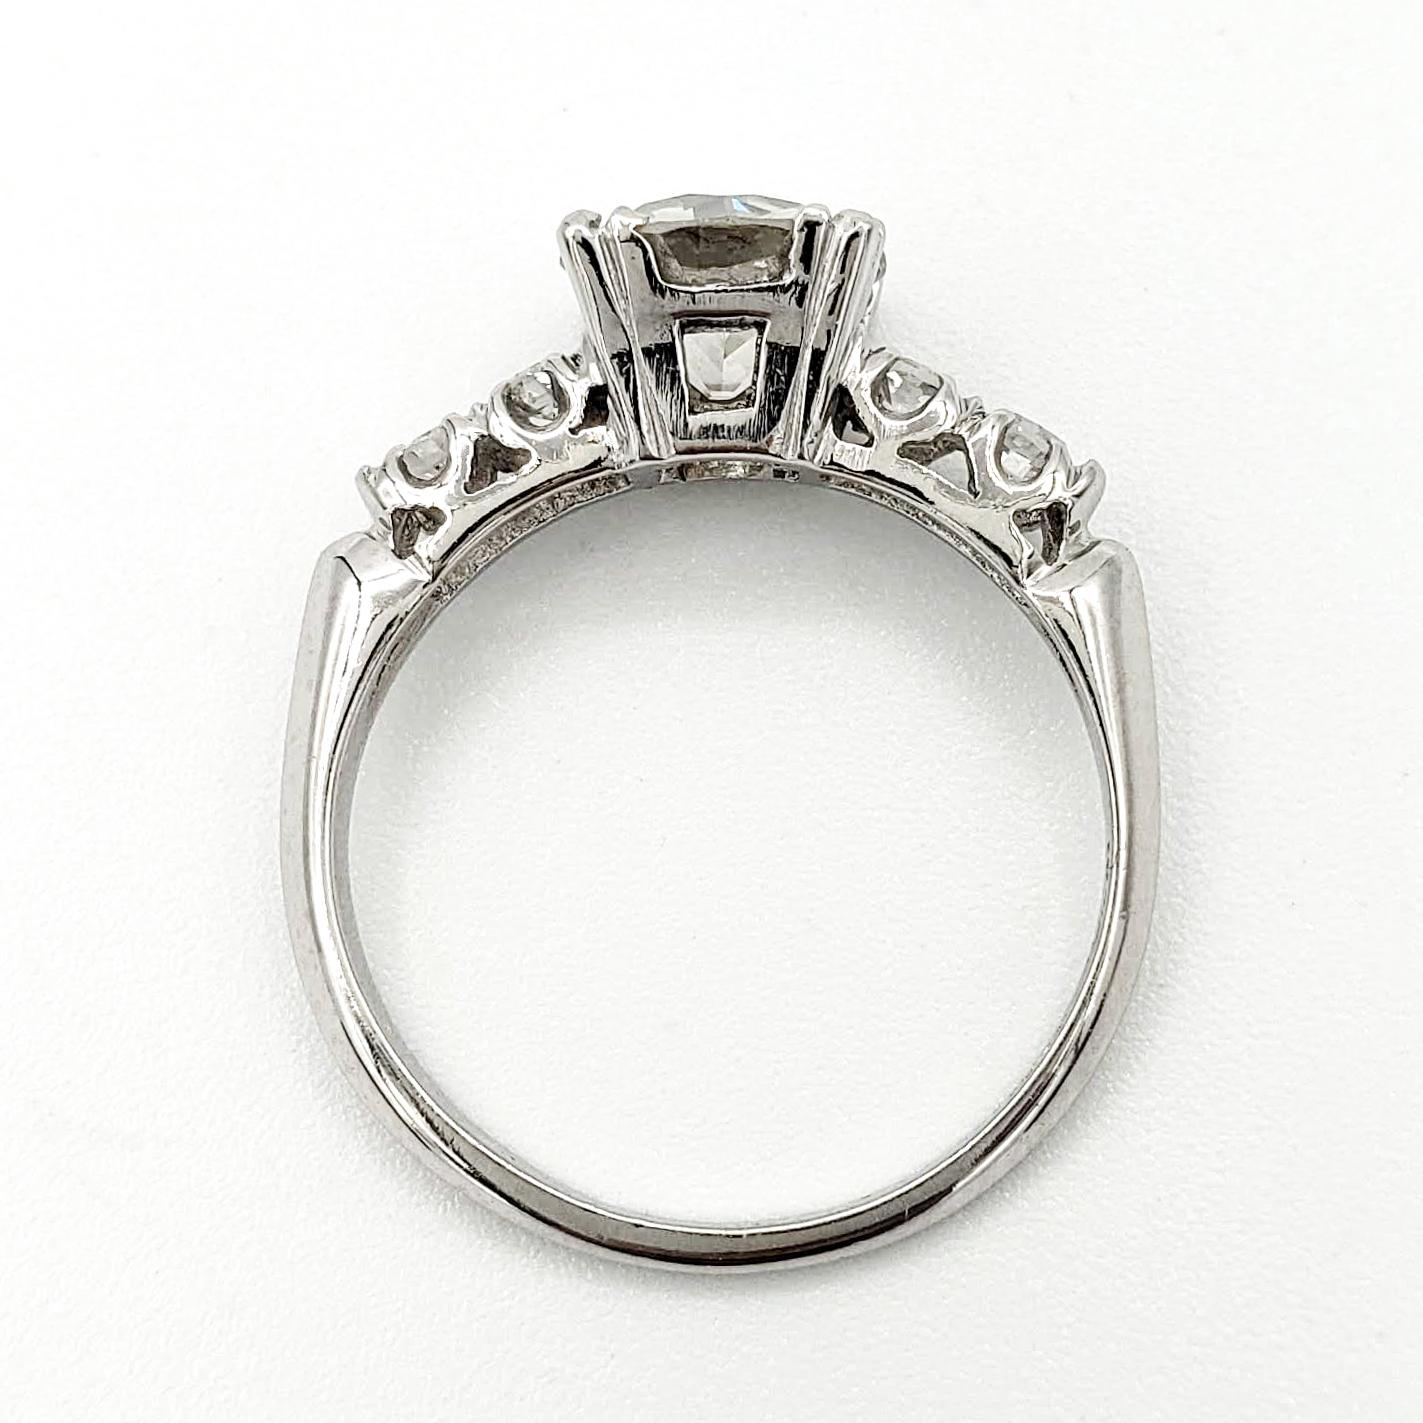 vintage-platinum-engagement-ring-with-1-29-carat-old-european-cut-diamond-egl-i-si1